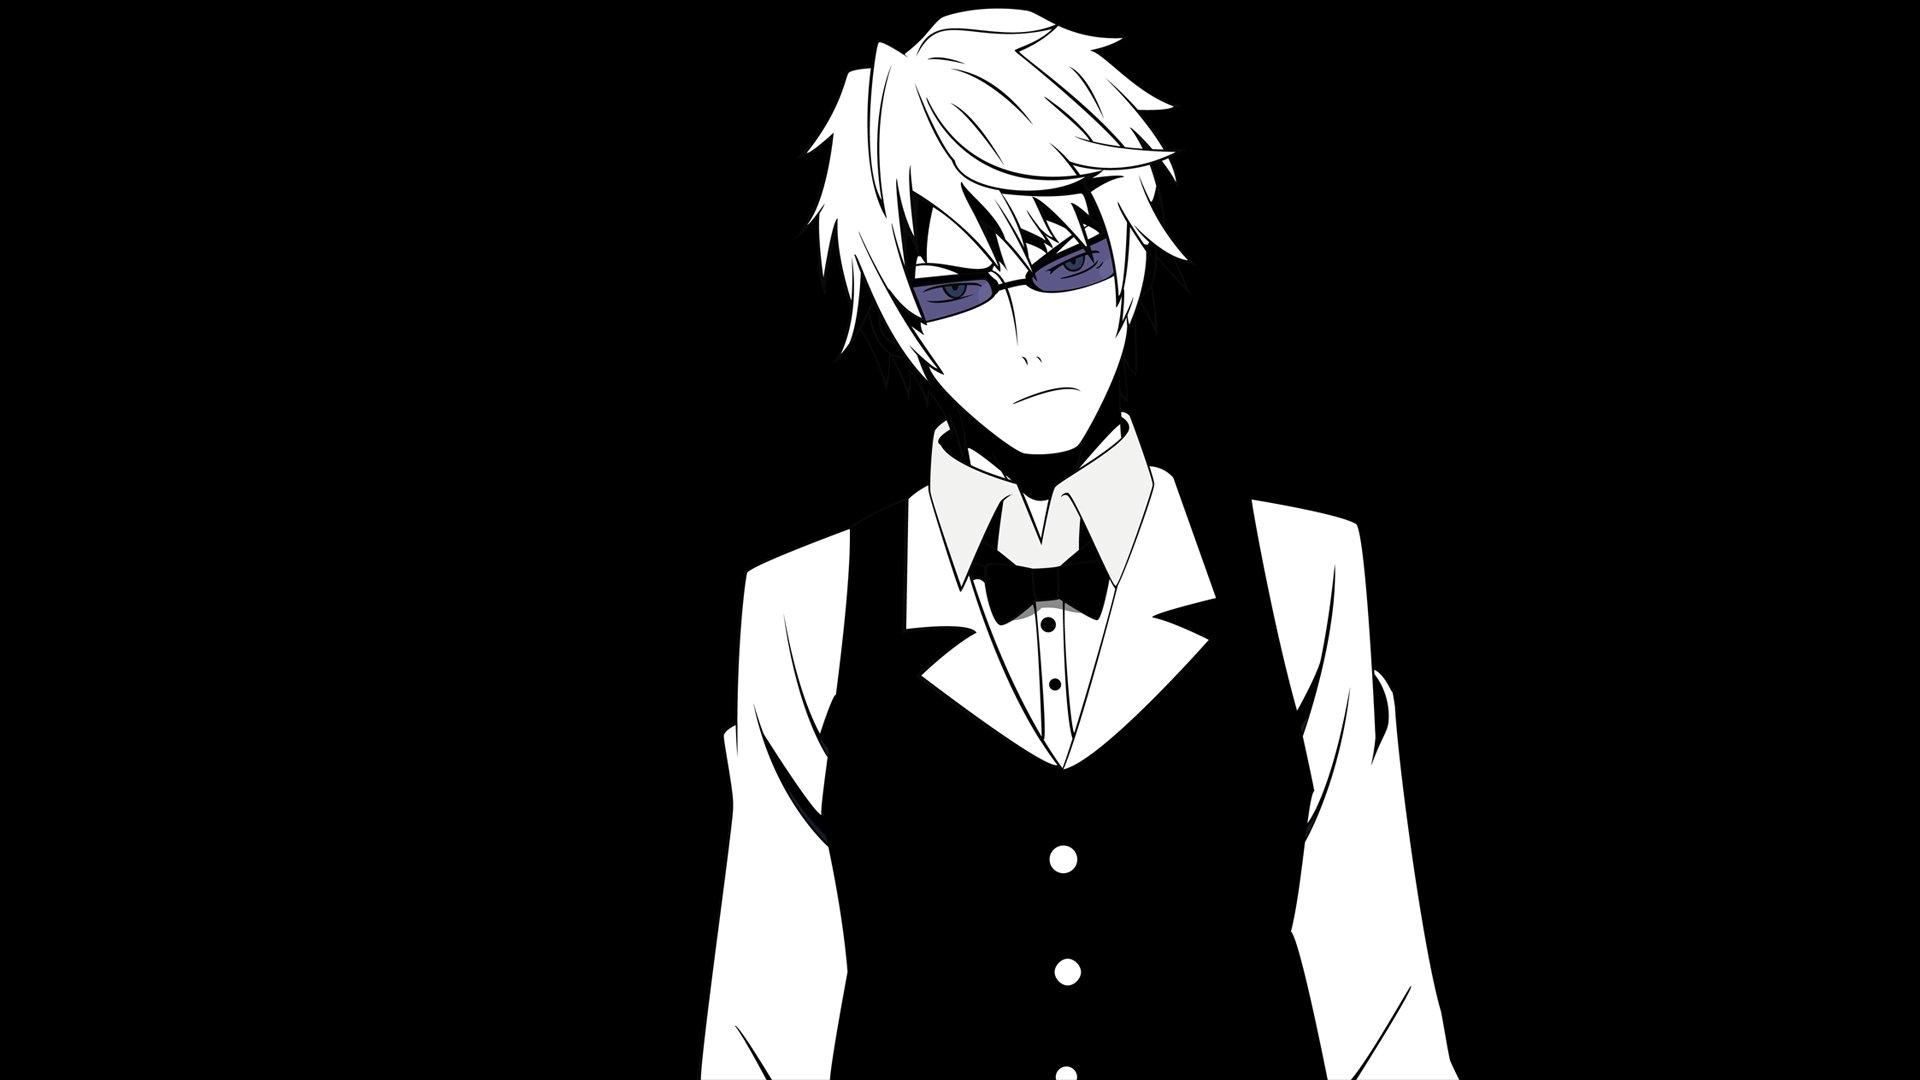 Black and white blue eyes sunglasses short hair durarara - Anime wallpaper black background ...